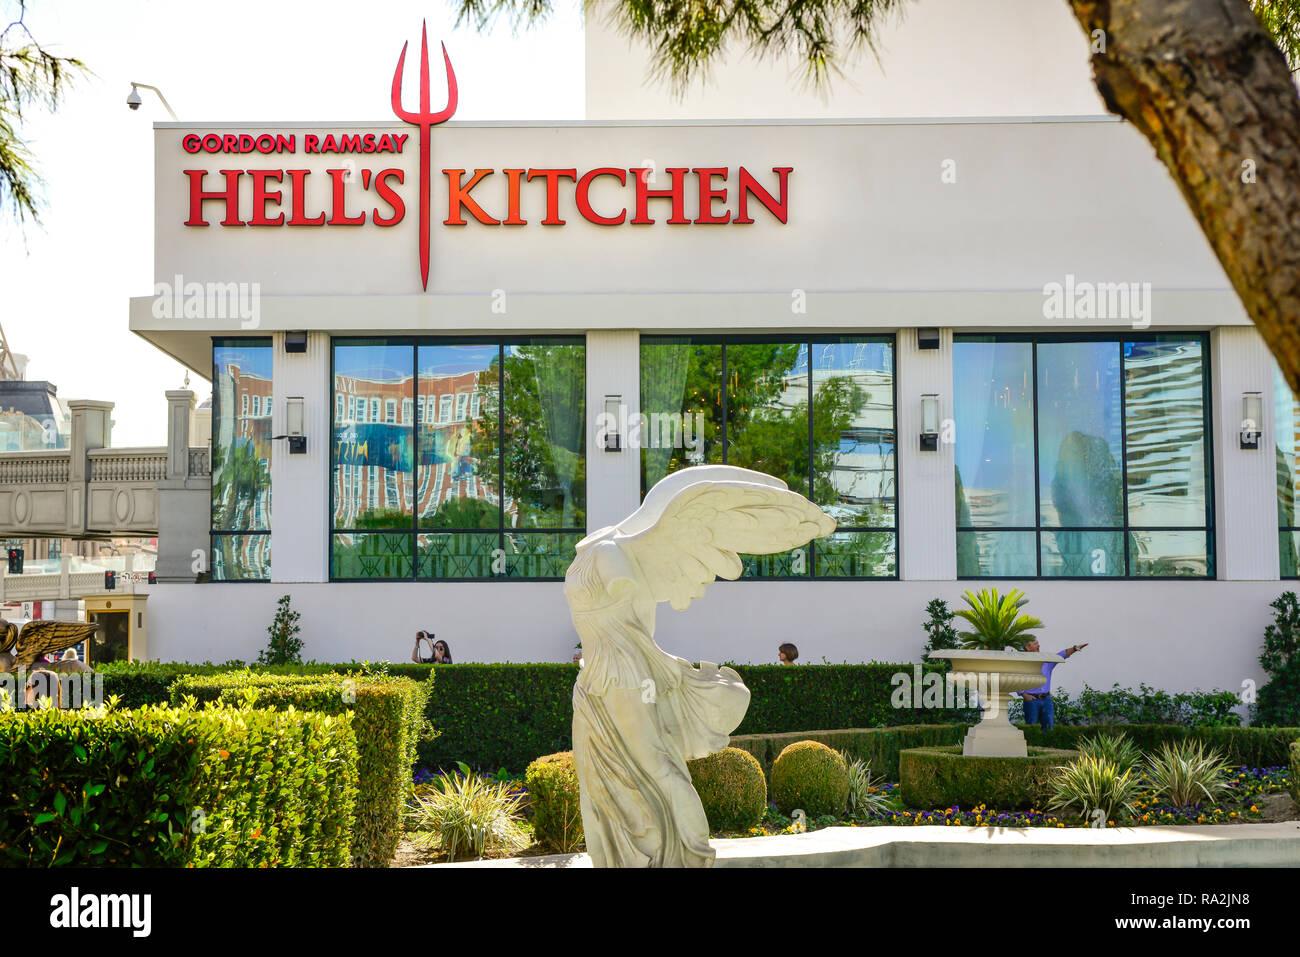 Hell S Kitchen Restaurant Von Gordon Ramsay In Las Vegas Nevada Stockfotografie Alamy